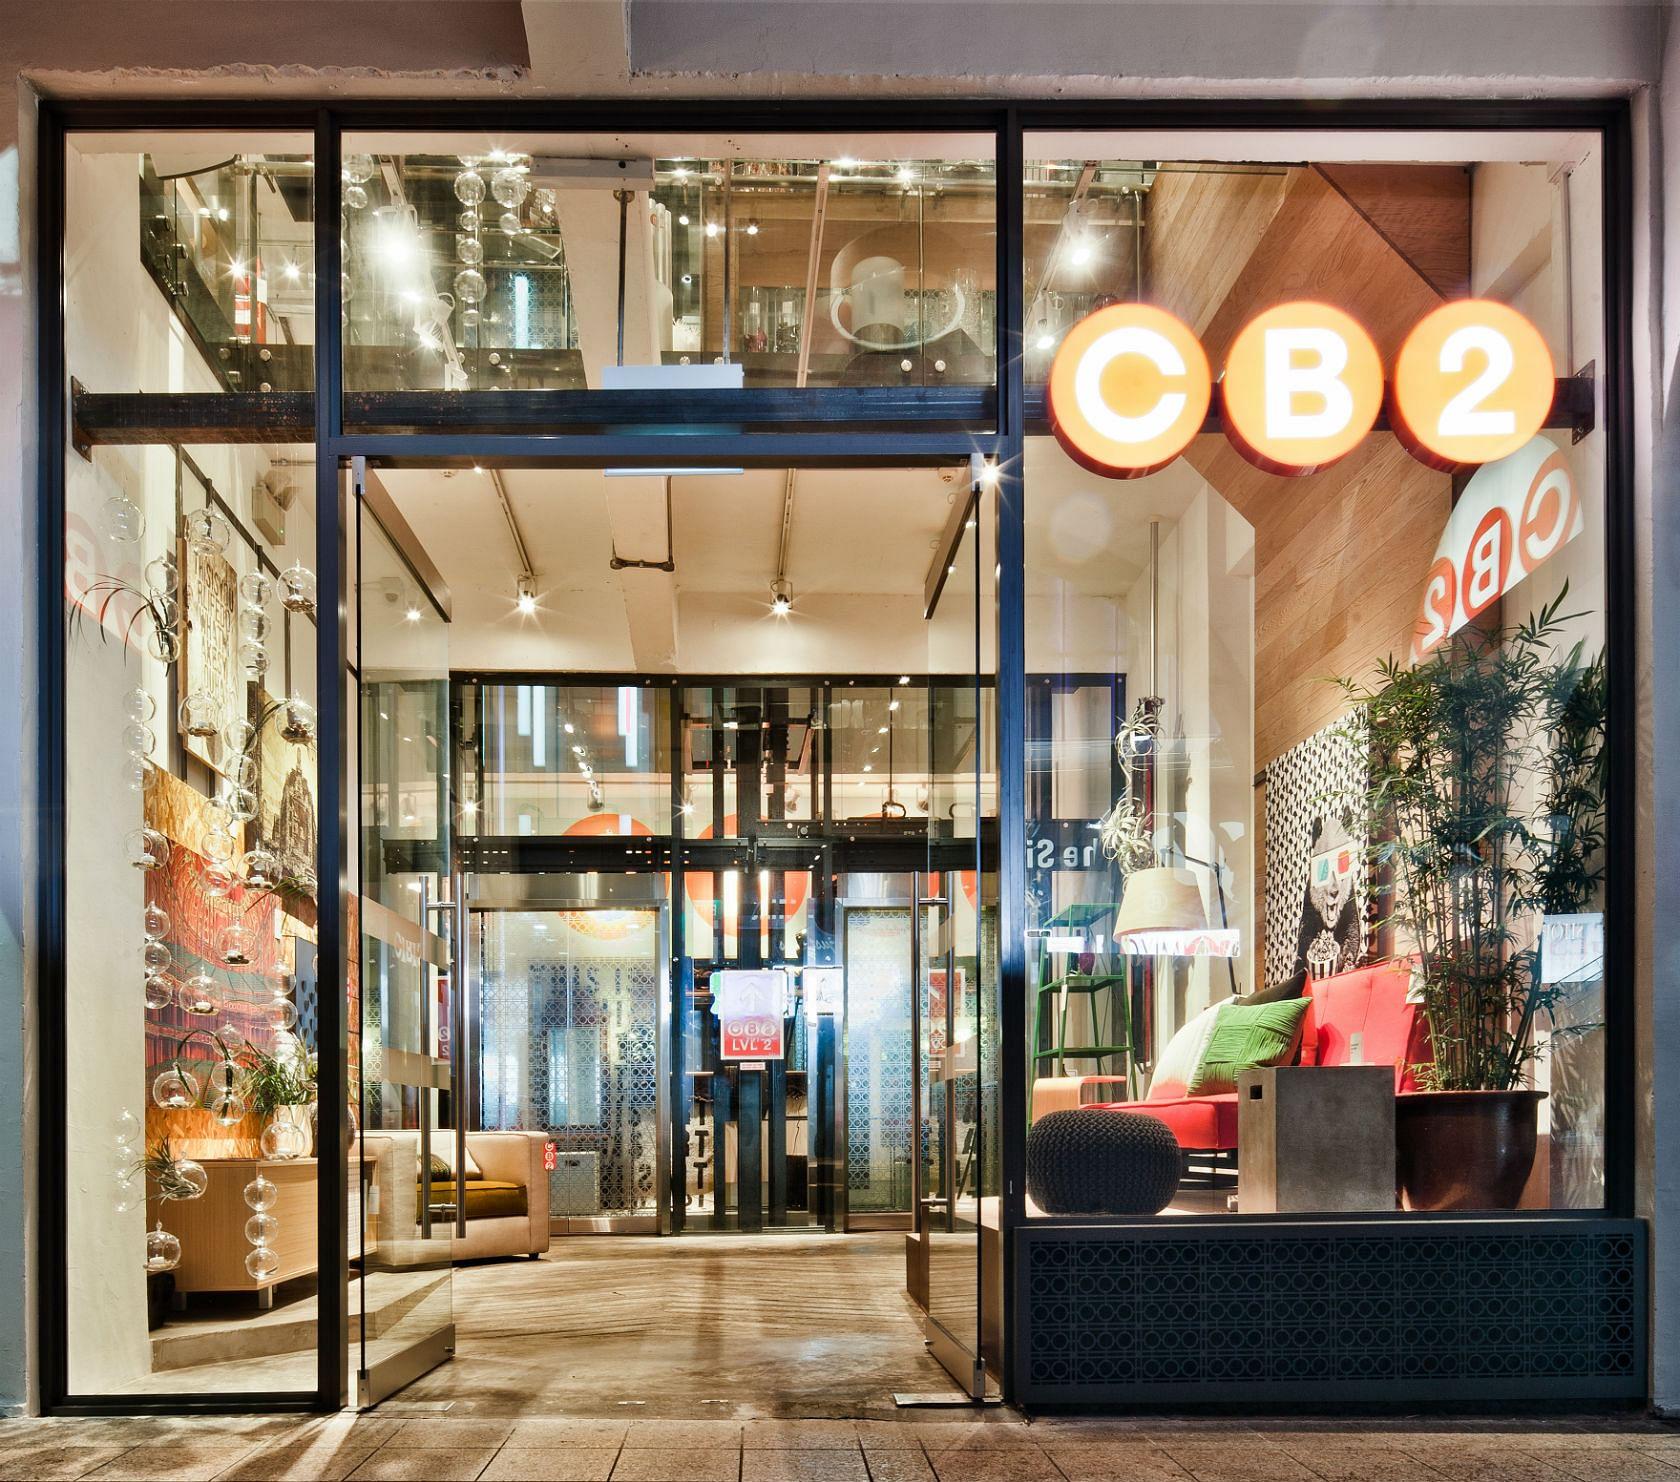 cb2 is closing big sale to come home decor singapore